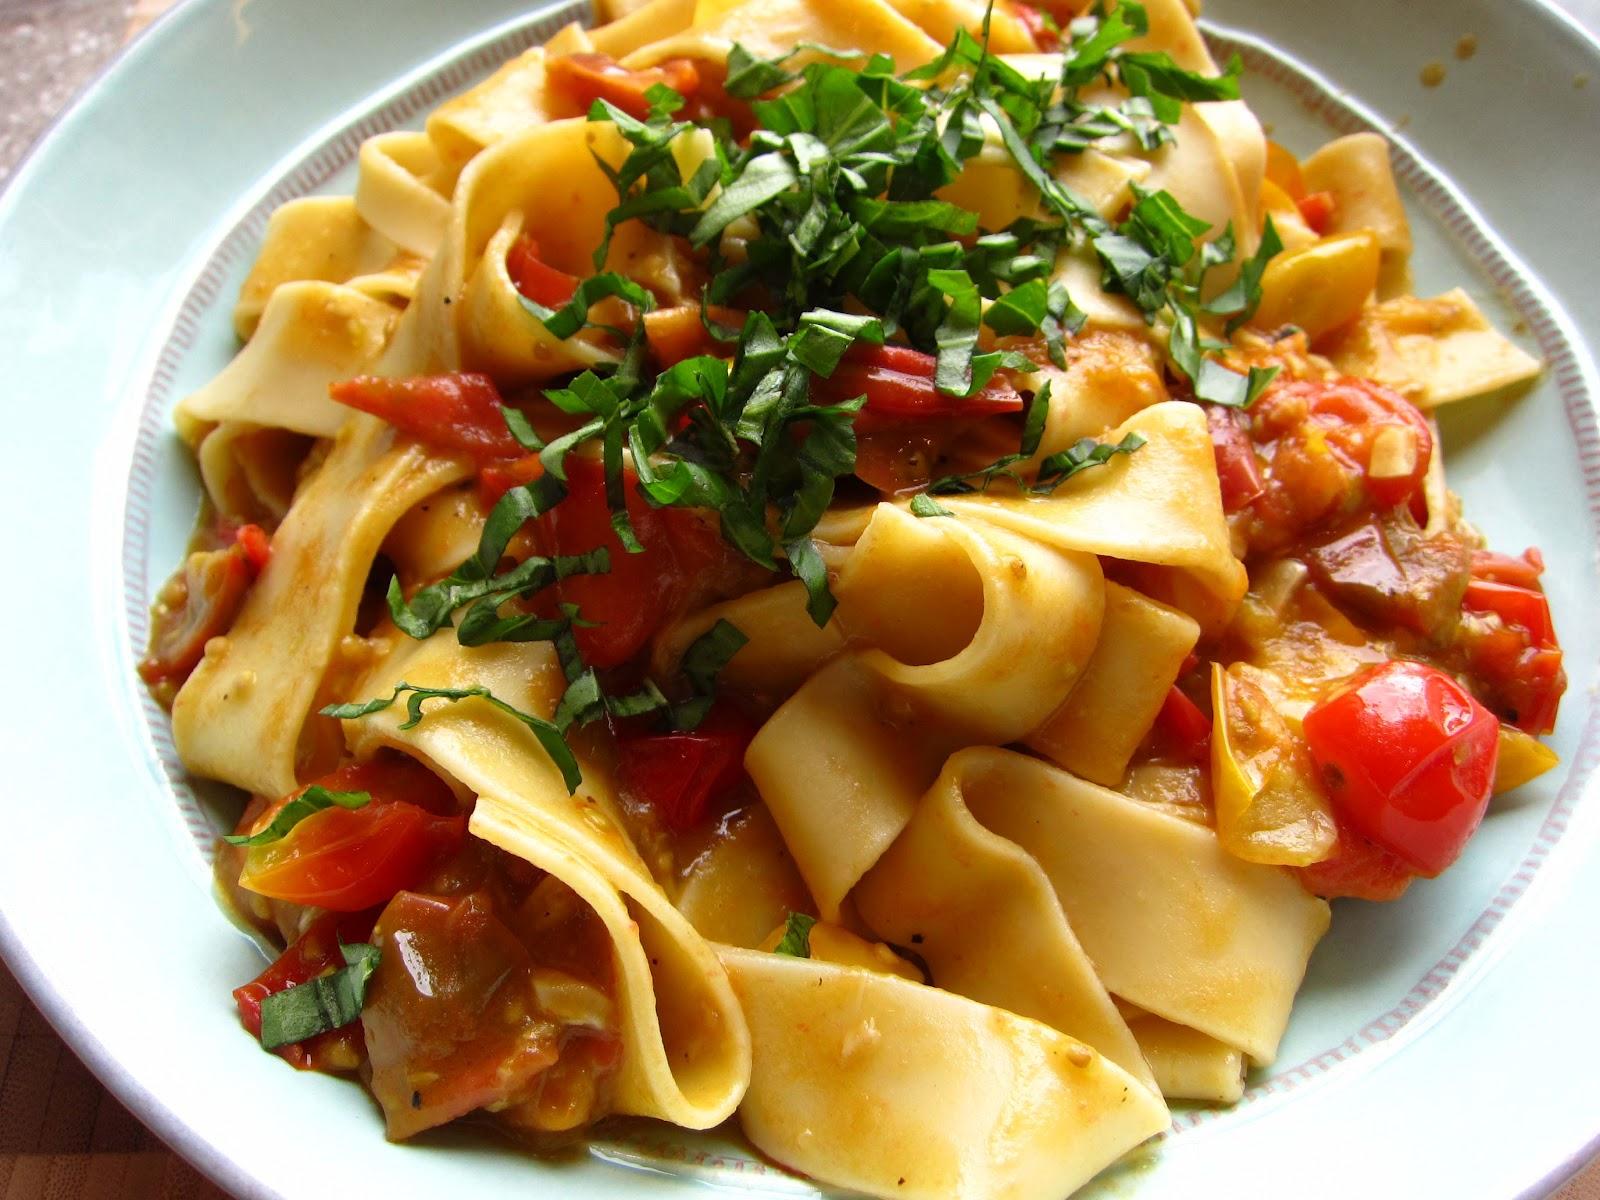 Gourmet mundo platos principales for Platos gourmet